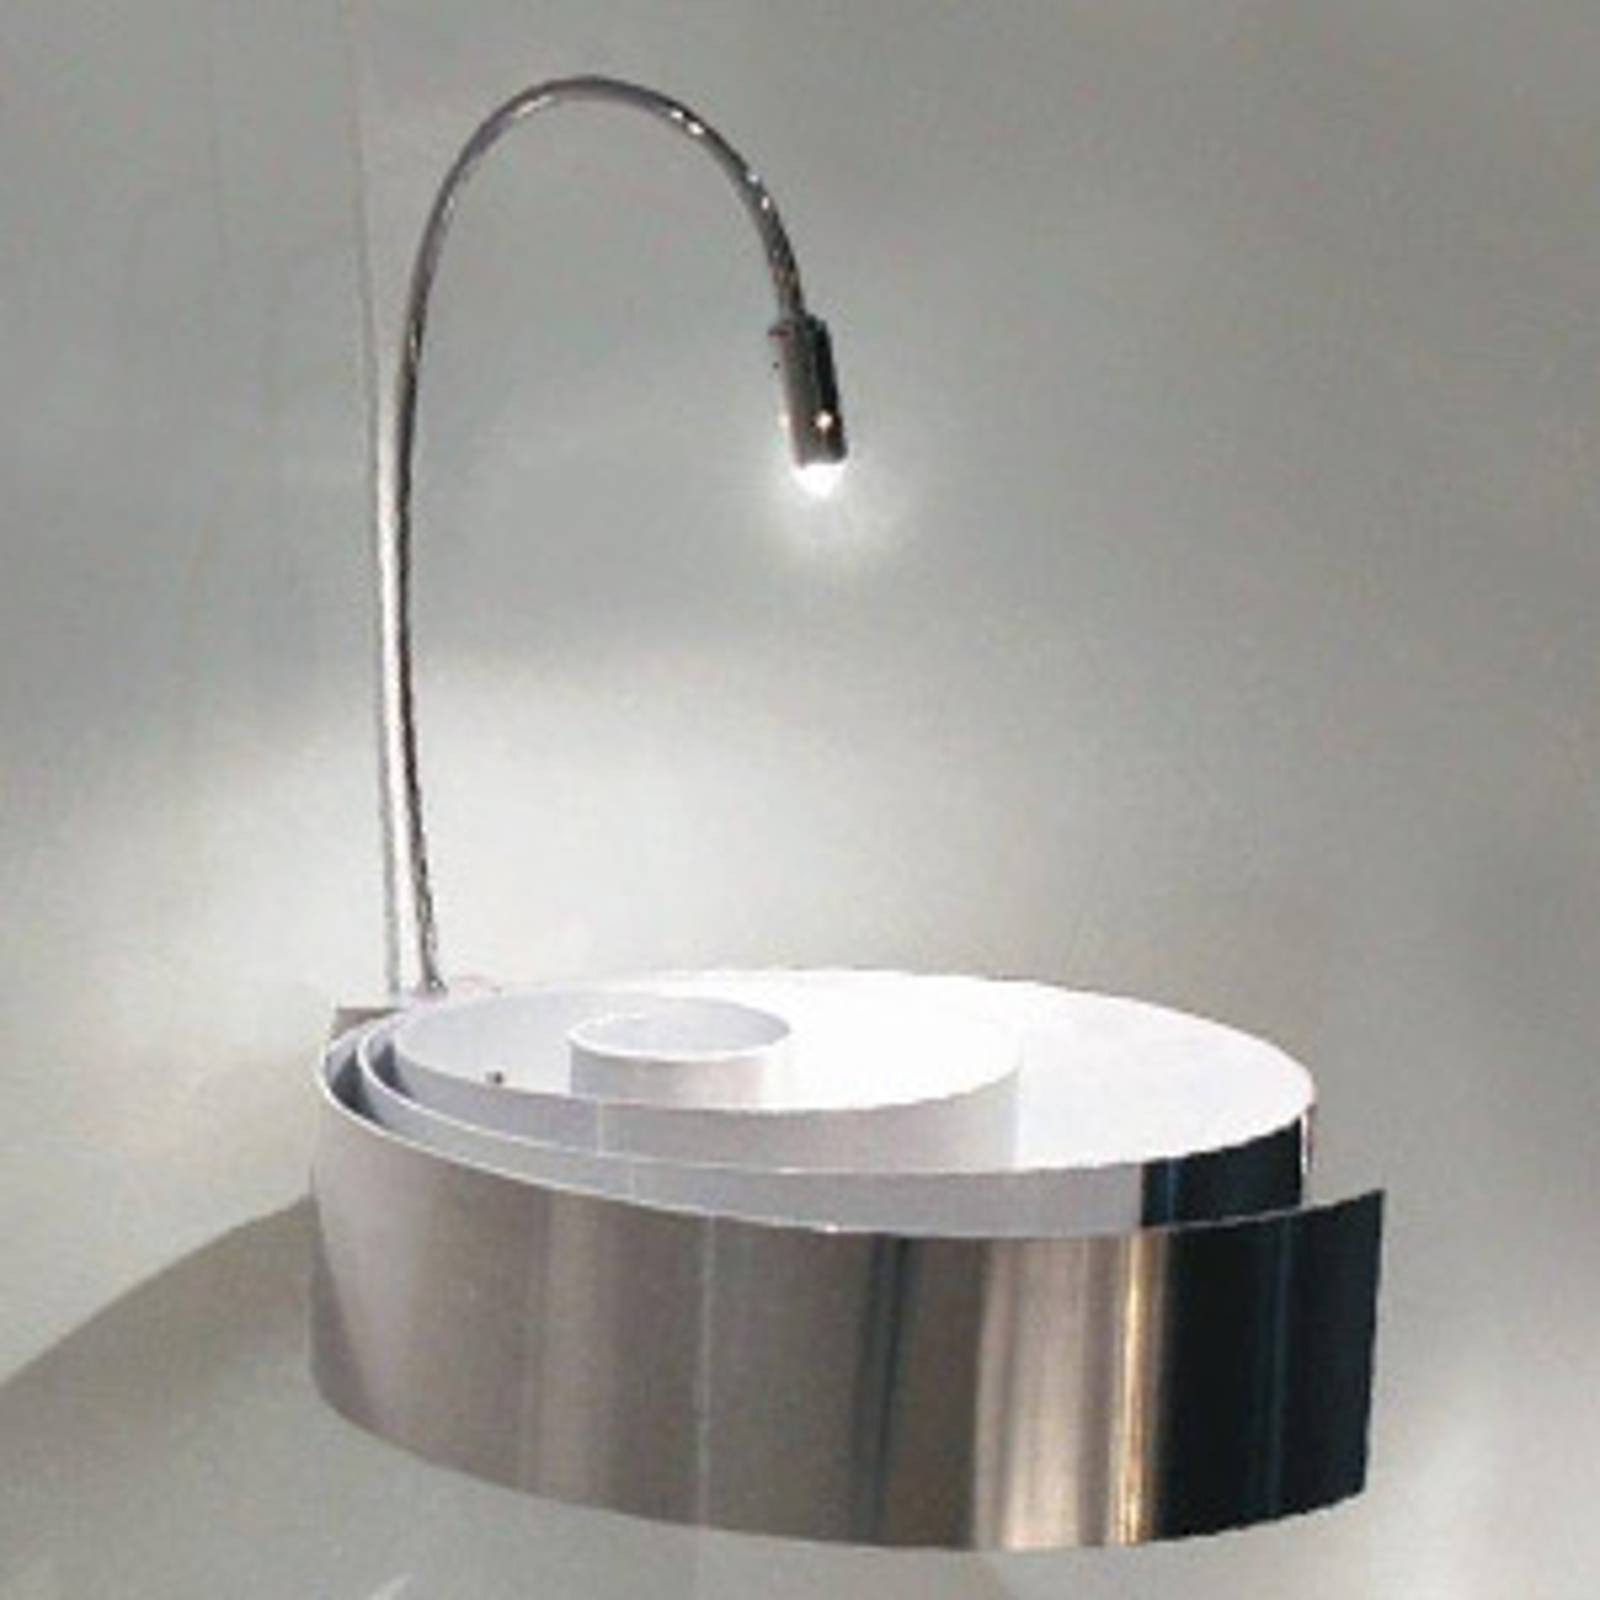 Exclusieve wandlamp Spirale, 35 cm